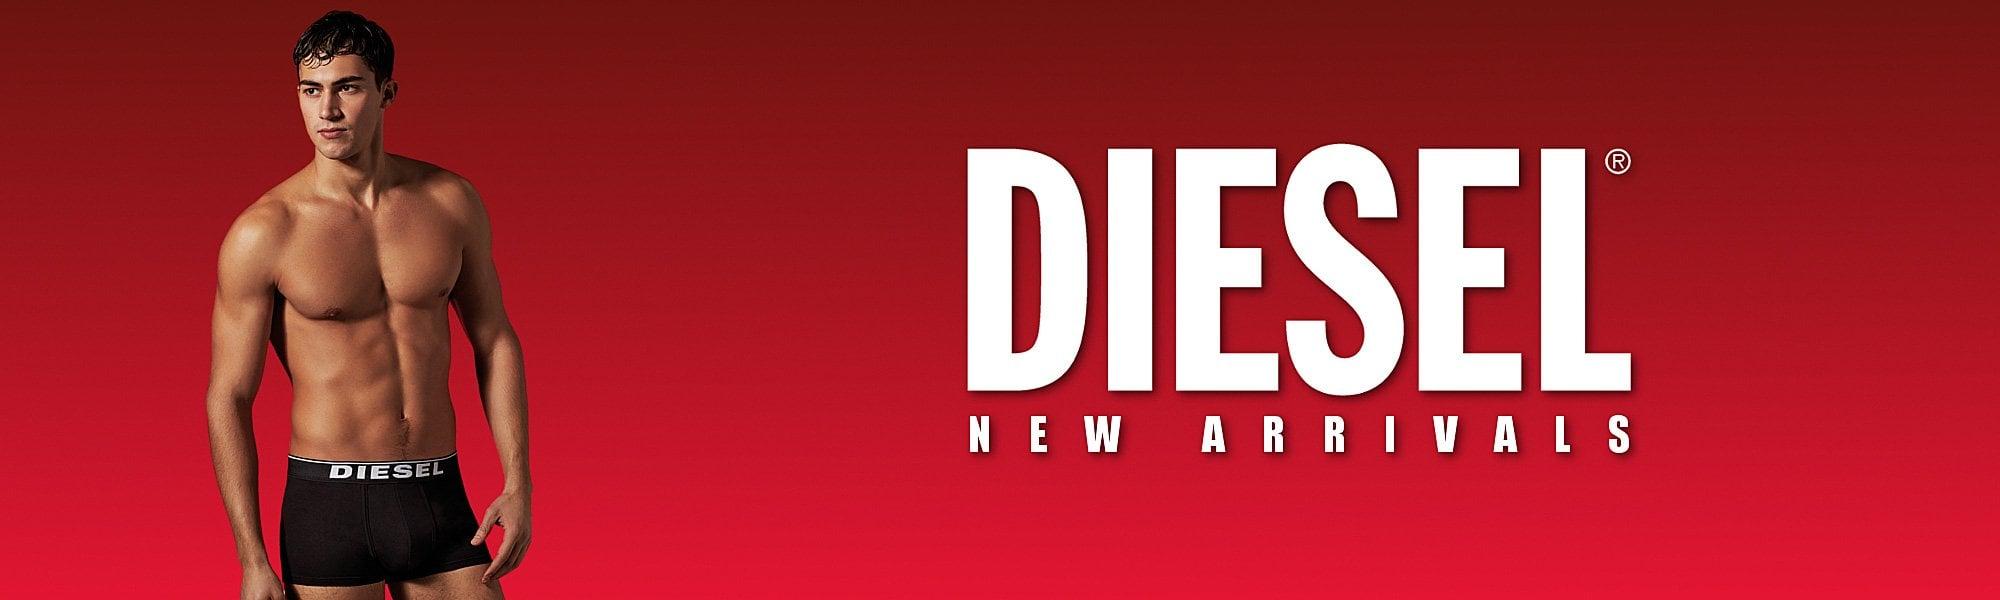 DIESEL NEW ARRIVALS